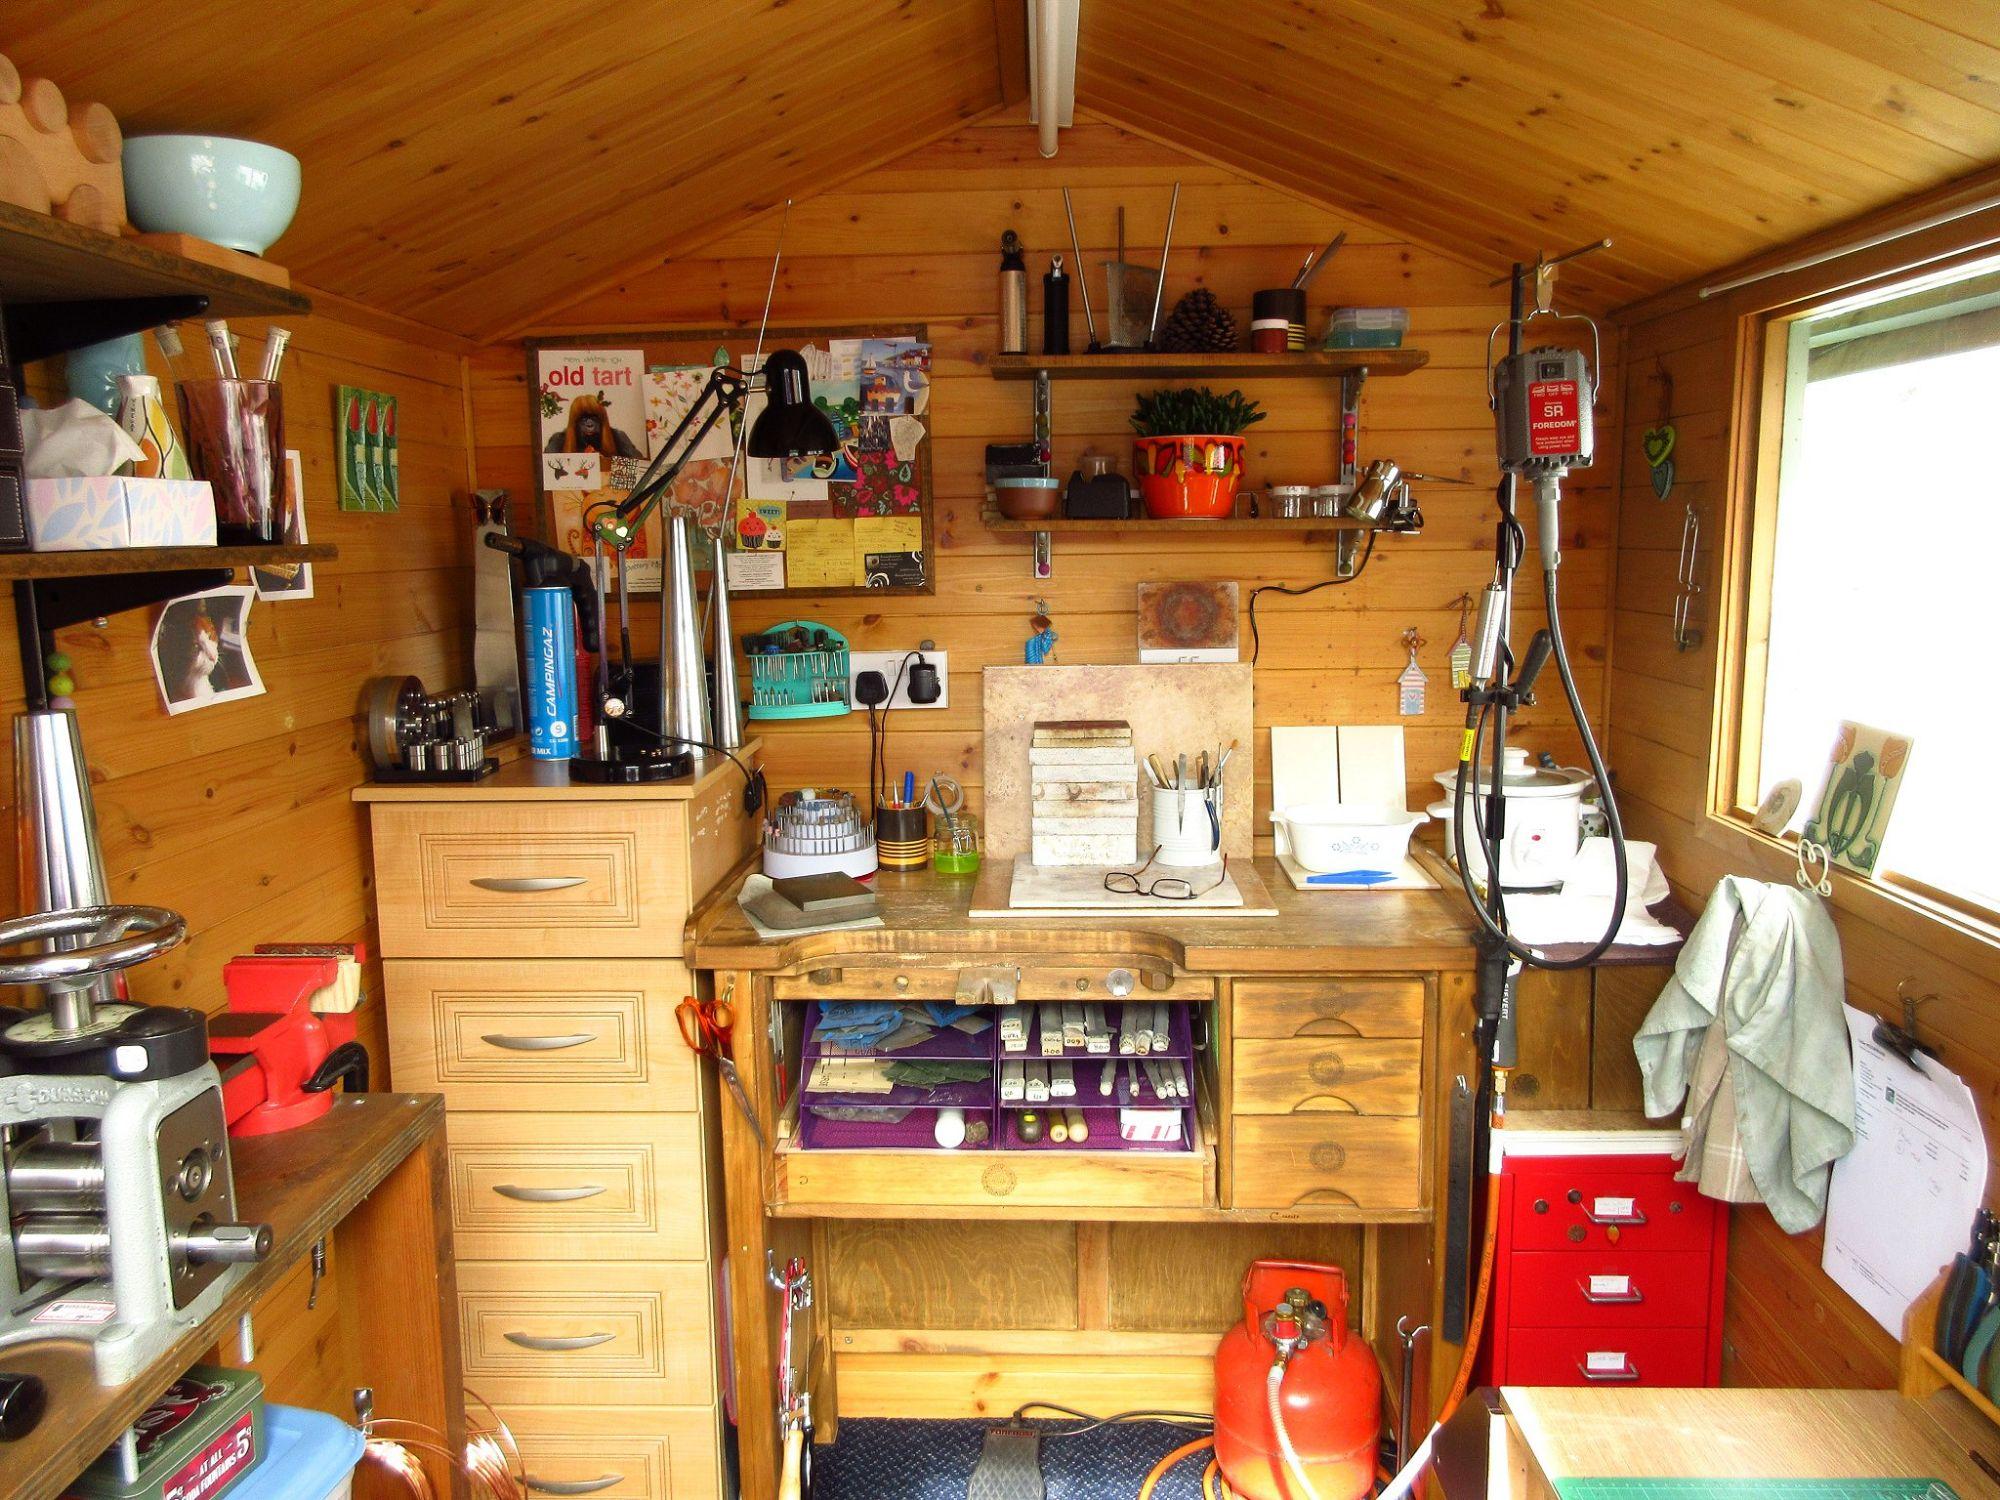 Cinnamon Jewellery work shed